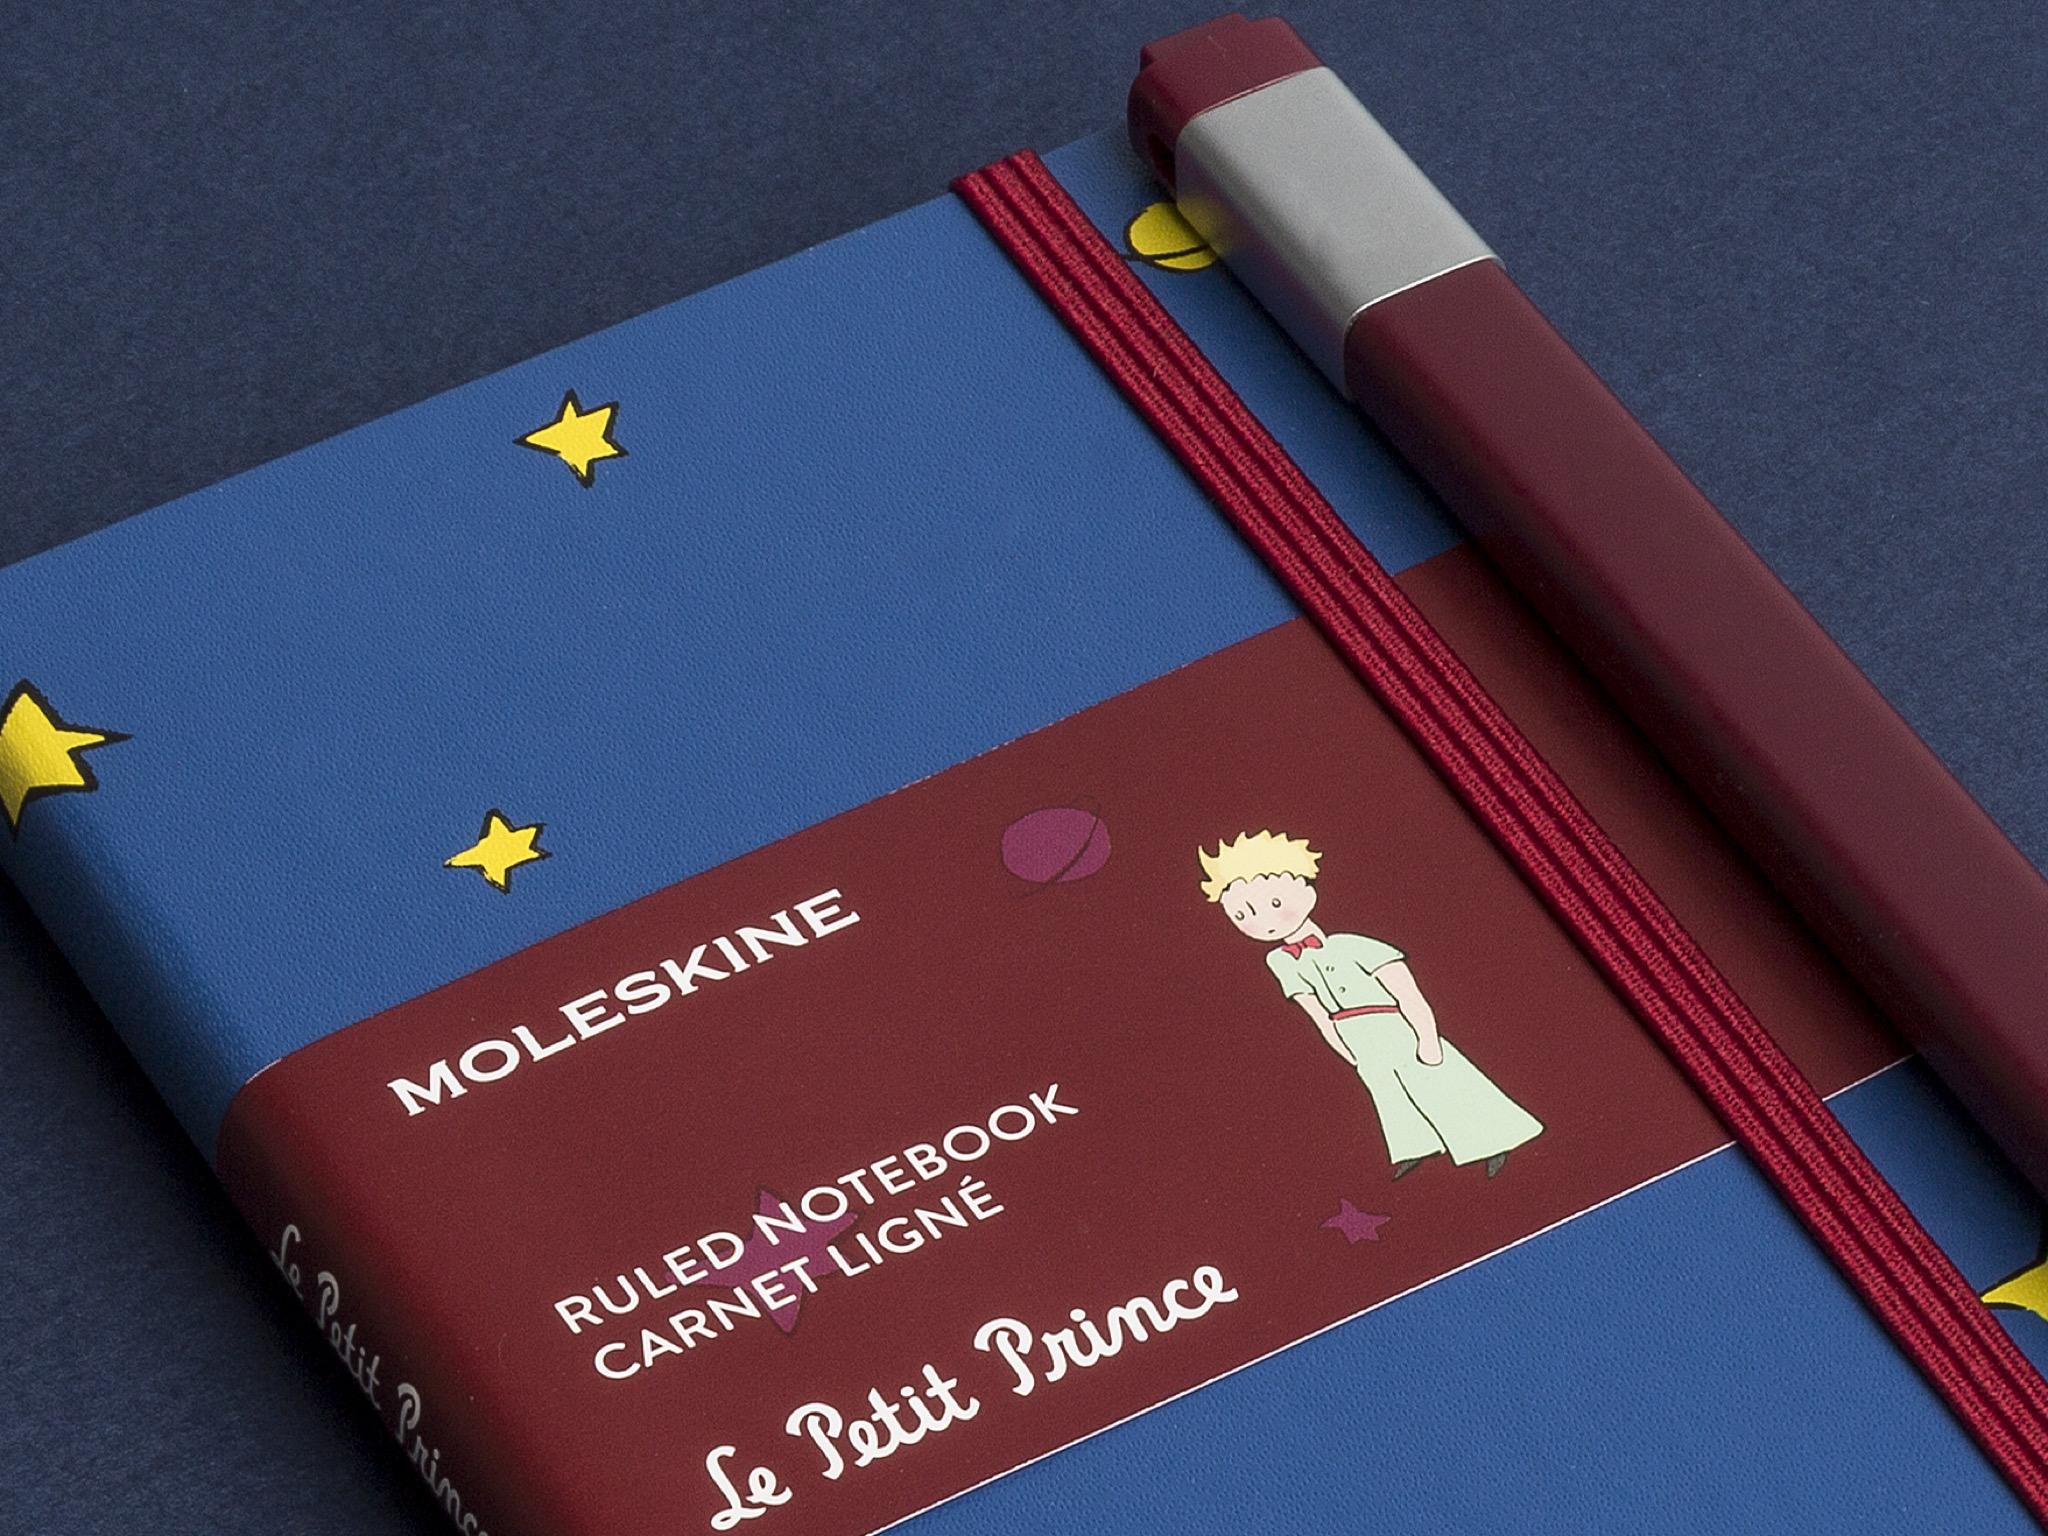 RS98917_Moleskine_Petit Prince_limited edition_Pocket_blue_close up